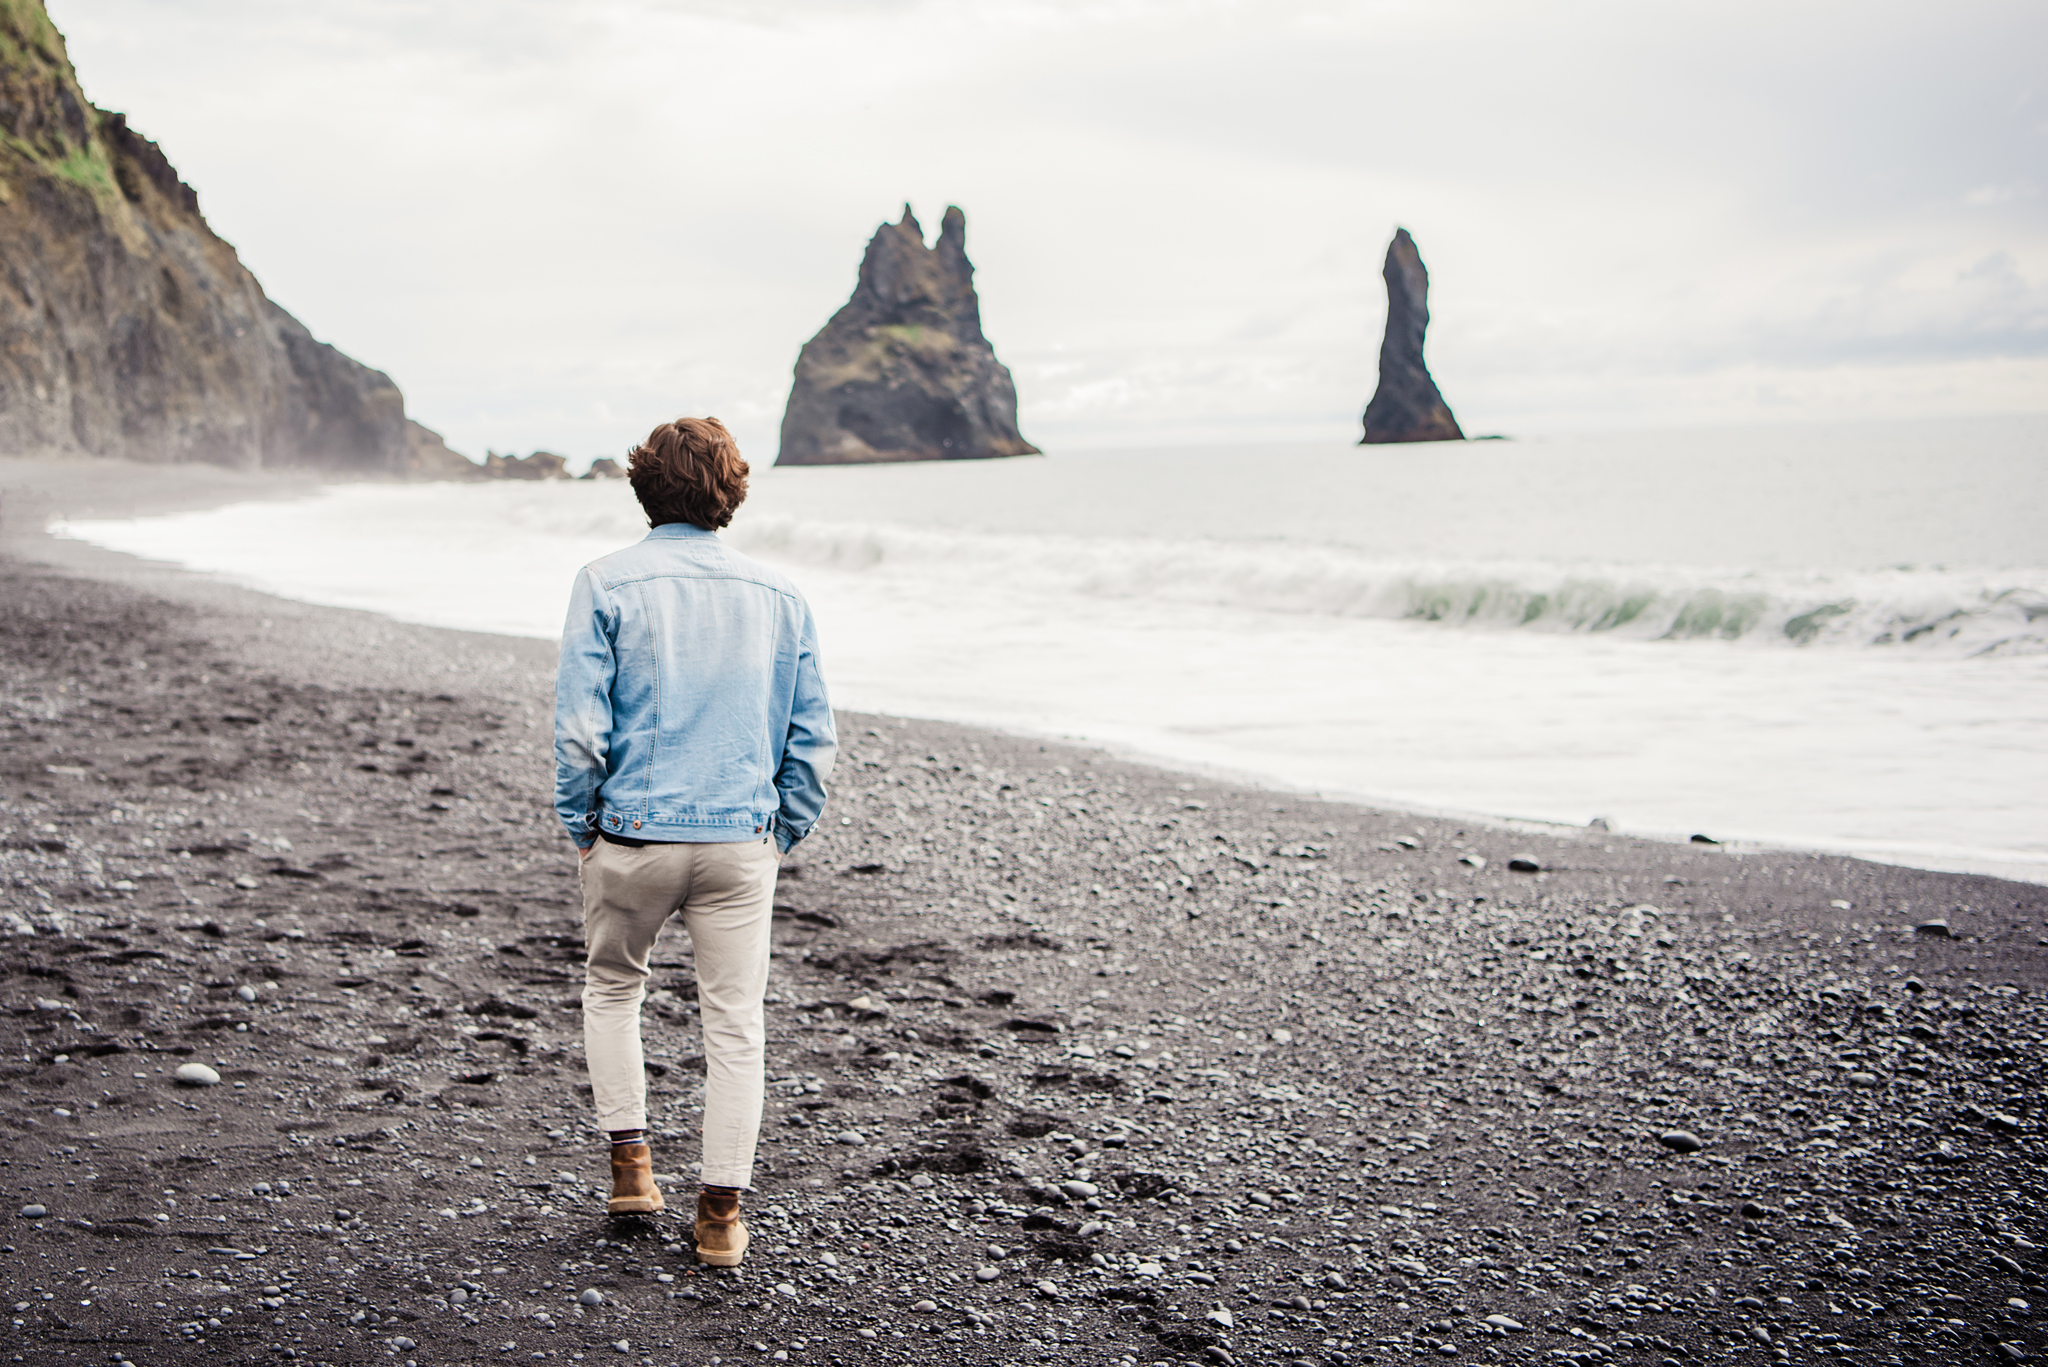 Iceland_Reynisfjara_Black_Sand_Beach_Couples_Session_JILL_STUDIO_Rochester_NY_Photographer_DSC_9723.jpg